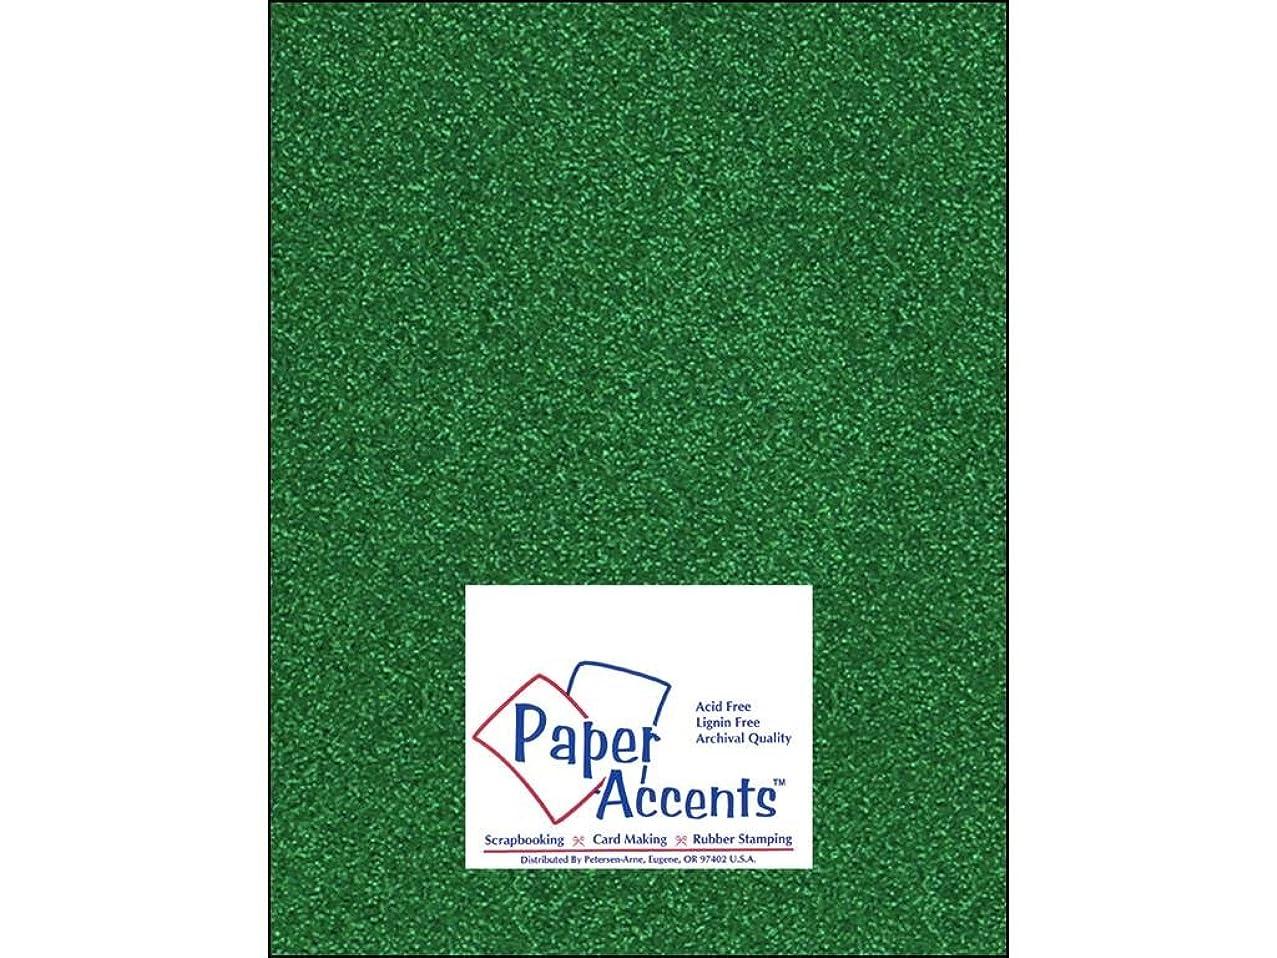 Accent Design Paper Accents Cdstk Glitter 8.5x11 85# Green